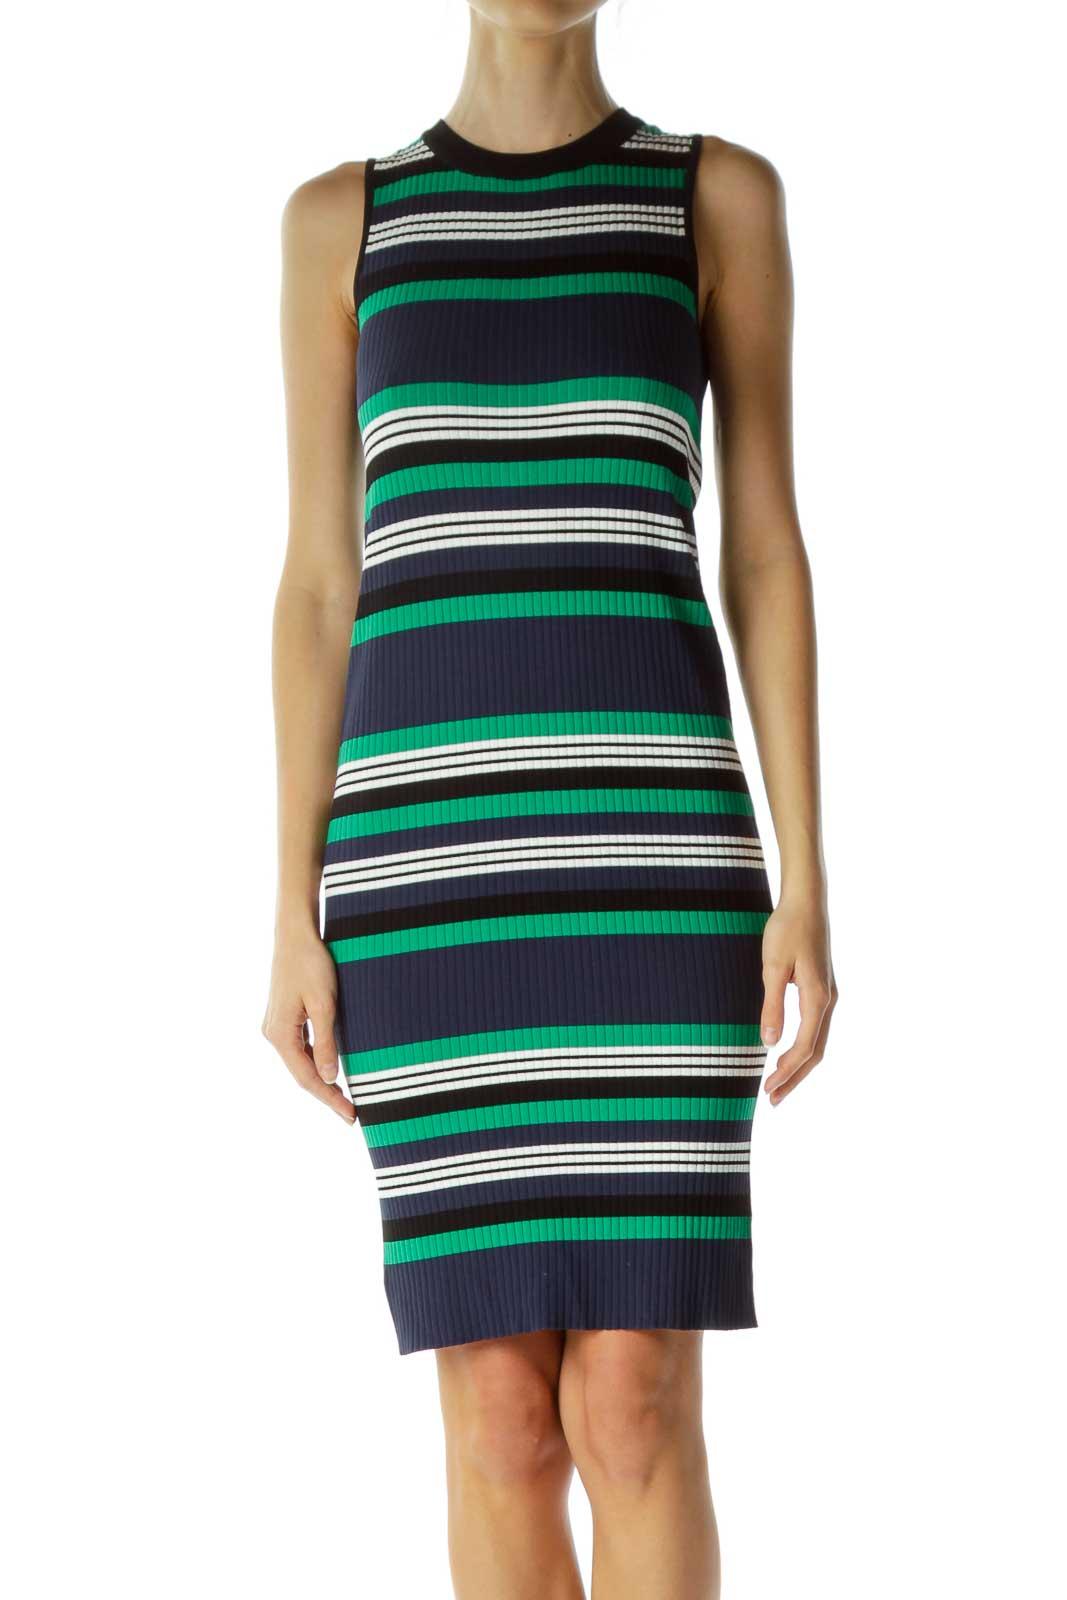 Green Navy Striped Sleeveless Knit Dress Front